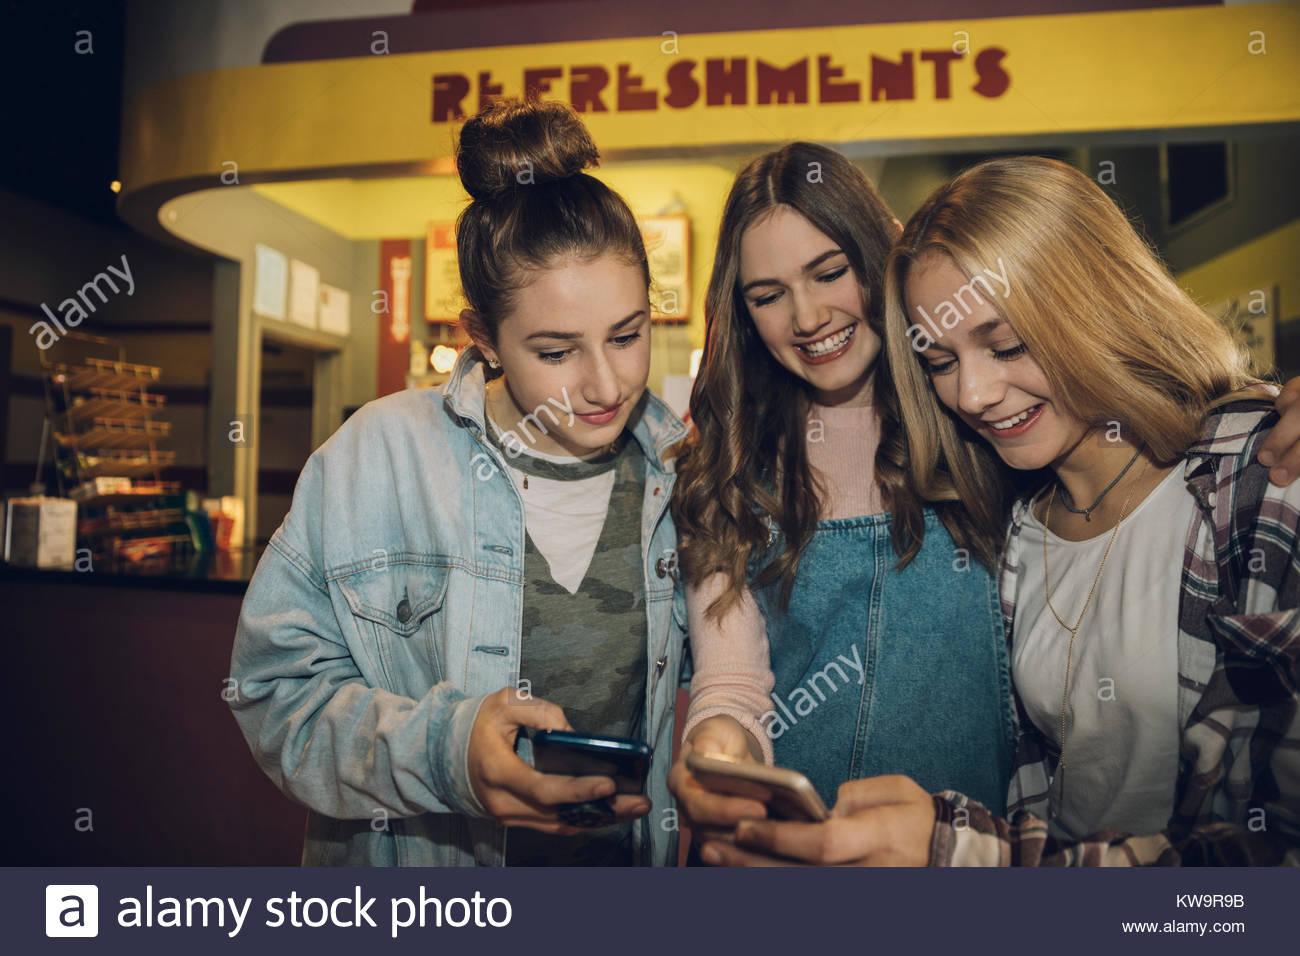 Sonriente interpolación caucásica amigas texto con teléfonos inteligentes en cine Imagen De Stock